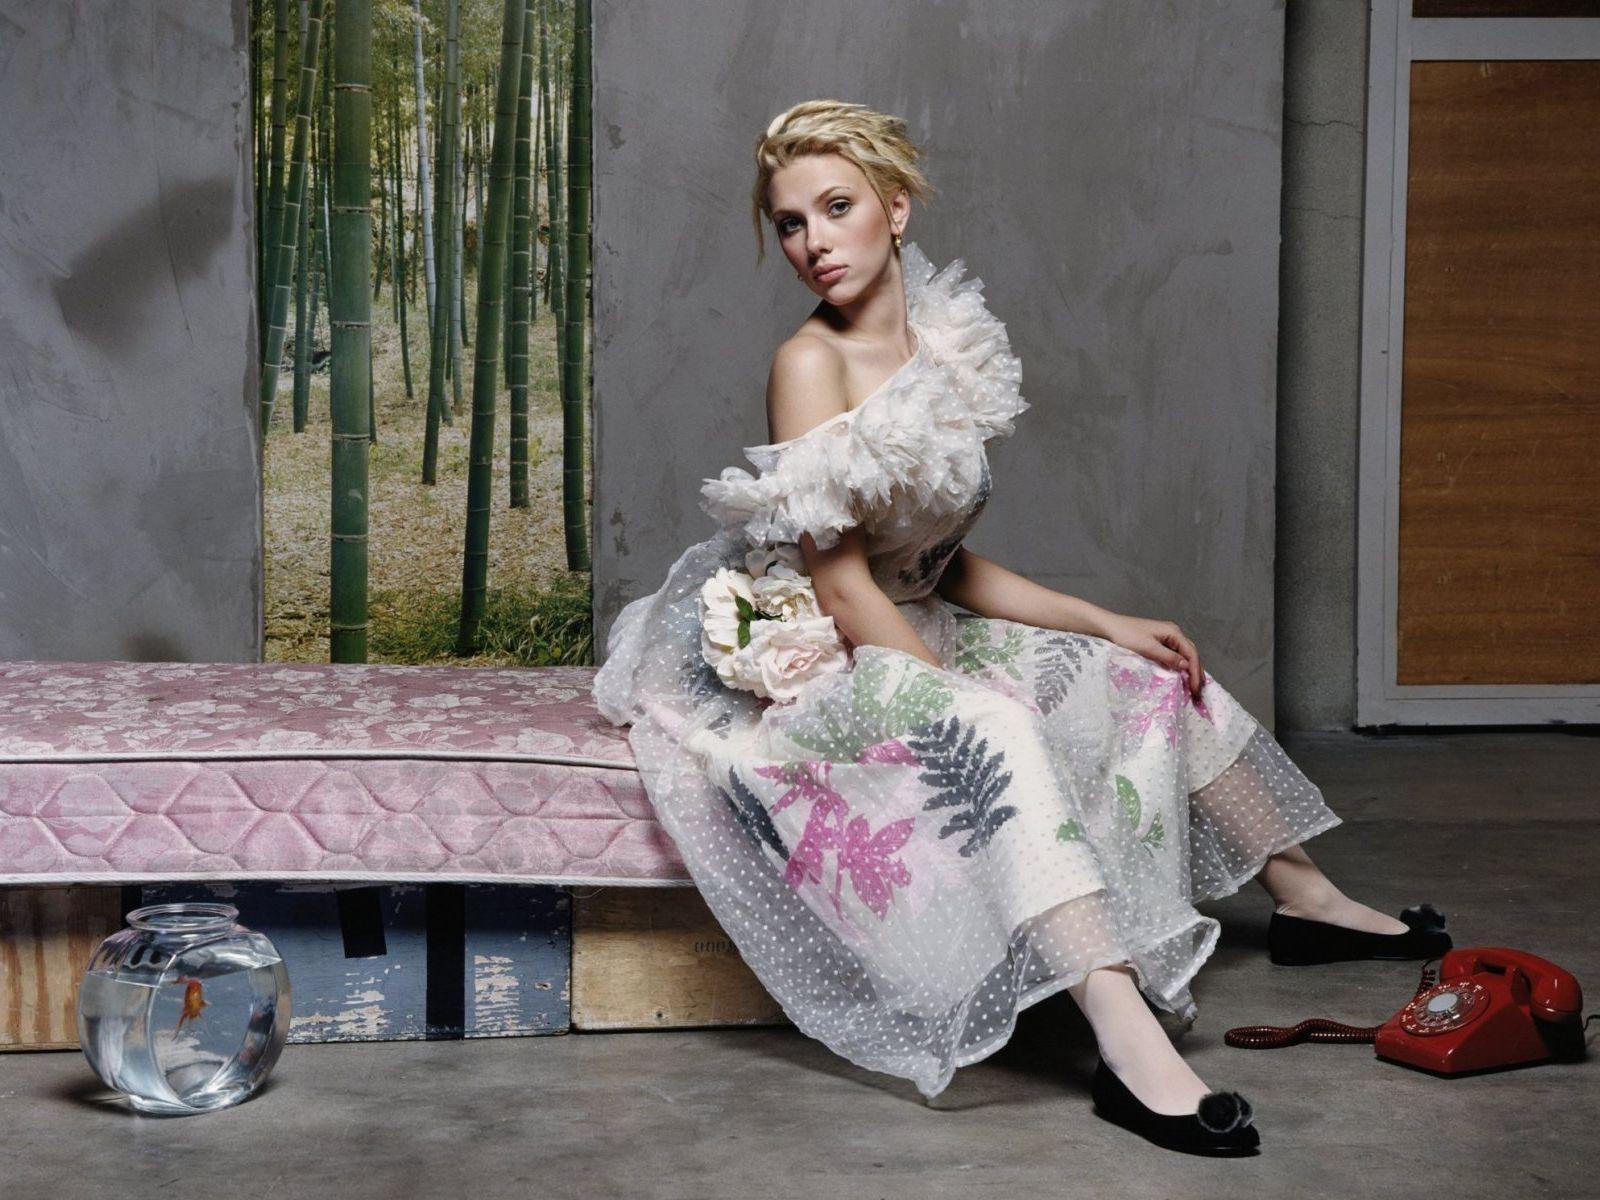 http://4.bp.blogspot.com/-GtEVAvrziwk/TrVutrj6m6I/AAAAAAAAIvc/LgVBNnm41I0/s1600/Scarlett_Johansson_style_Wallpapers.jpg